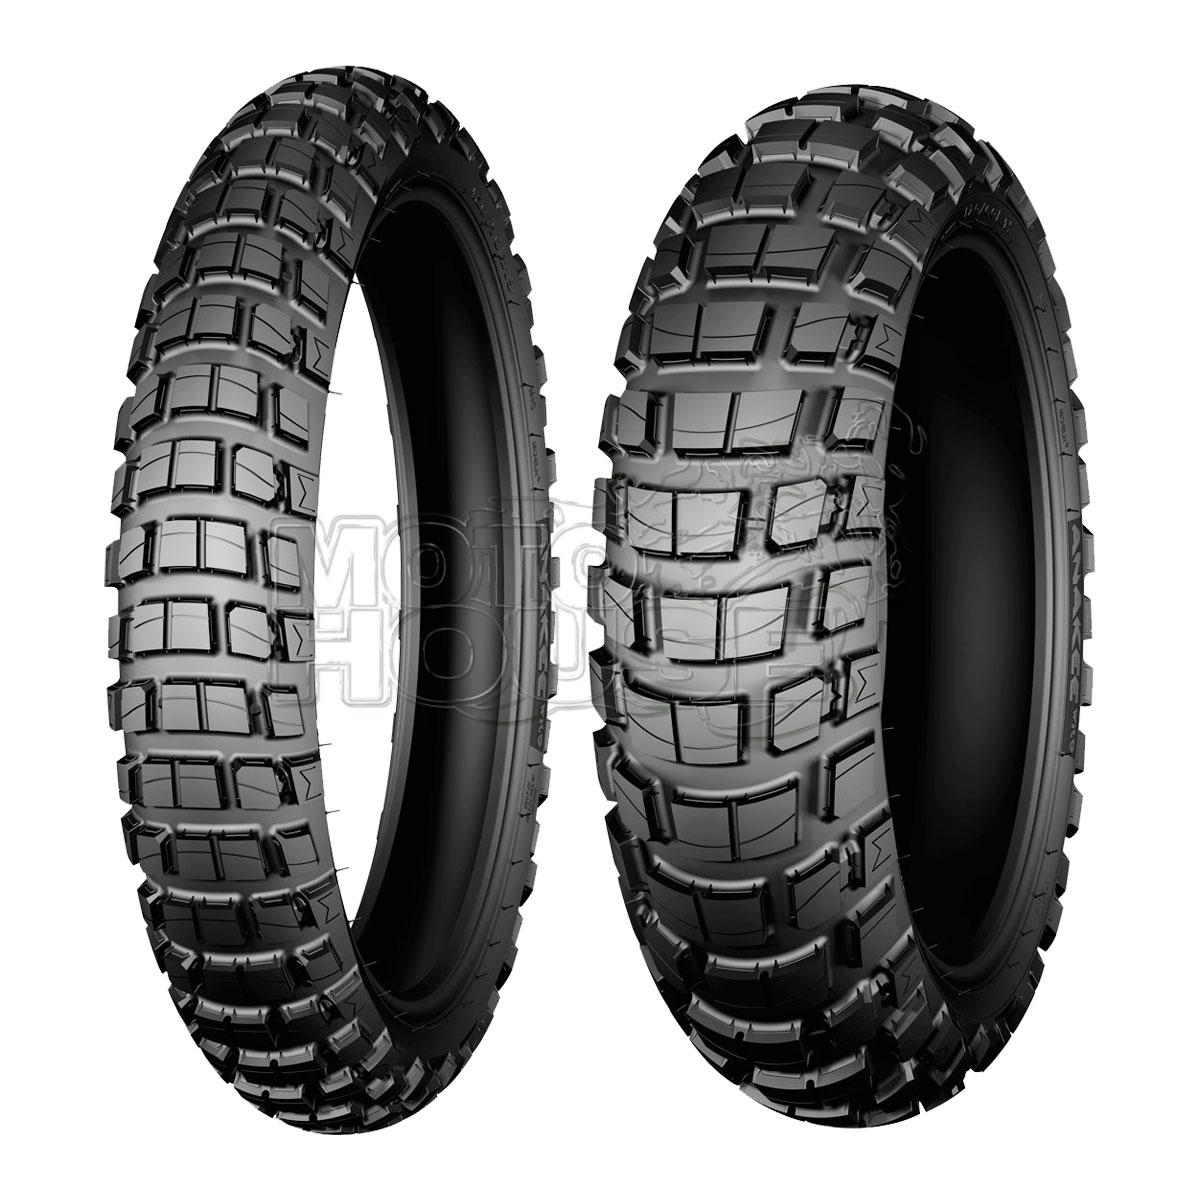 Llanta Moto Michelin Anakee Wild 170/60-17 72r